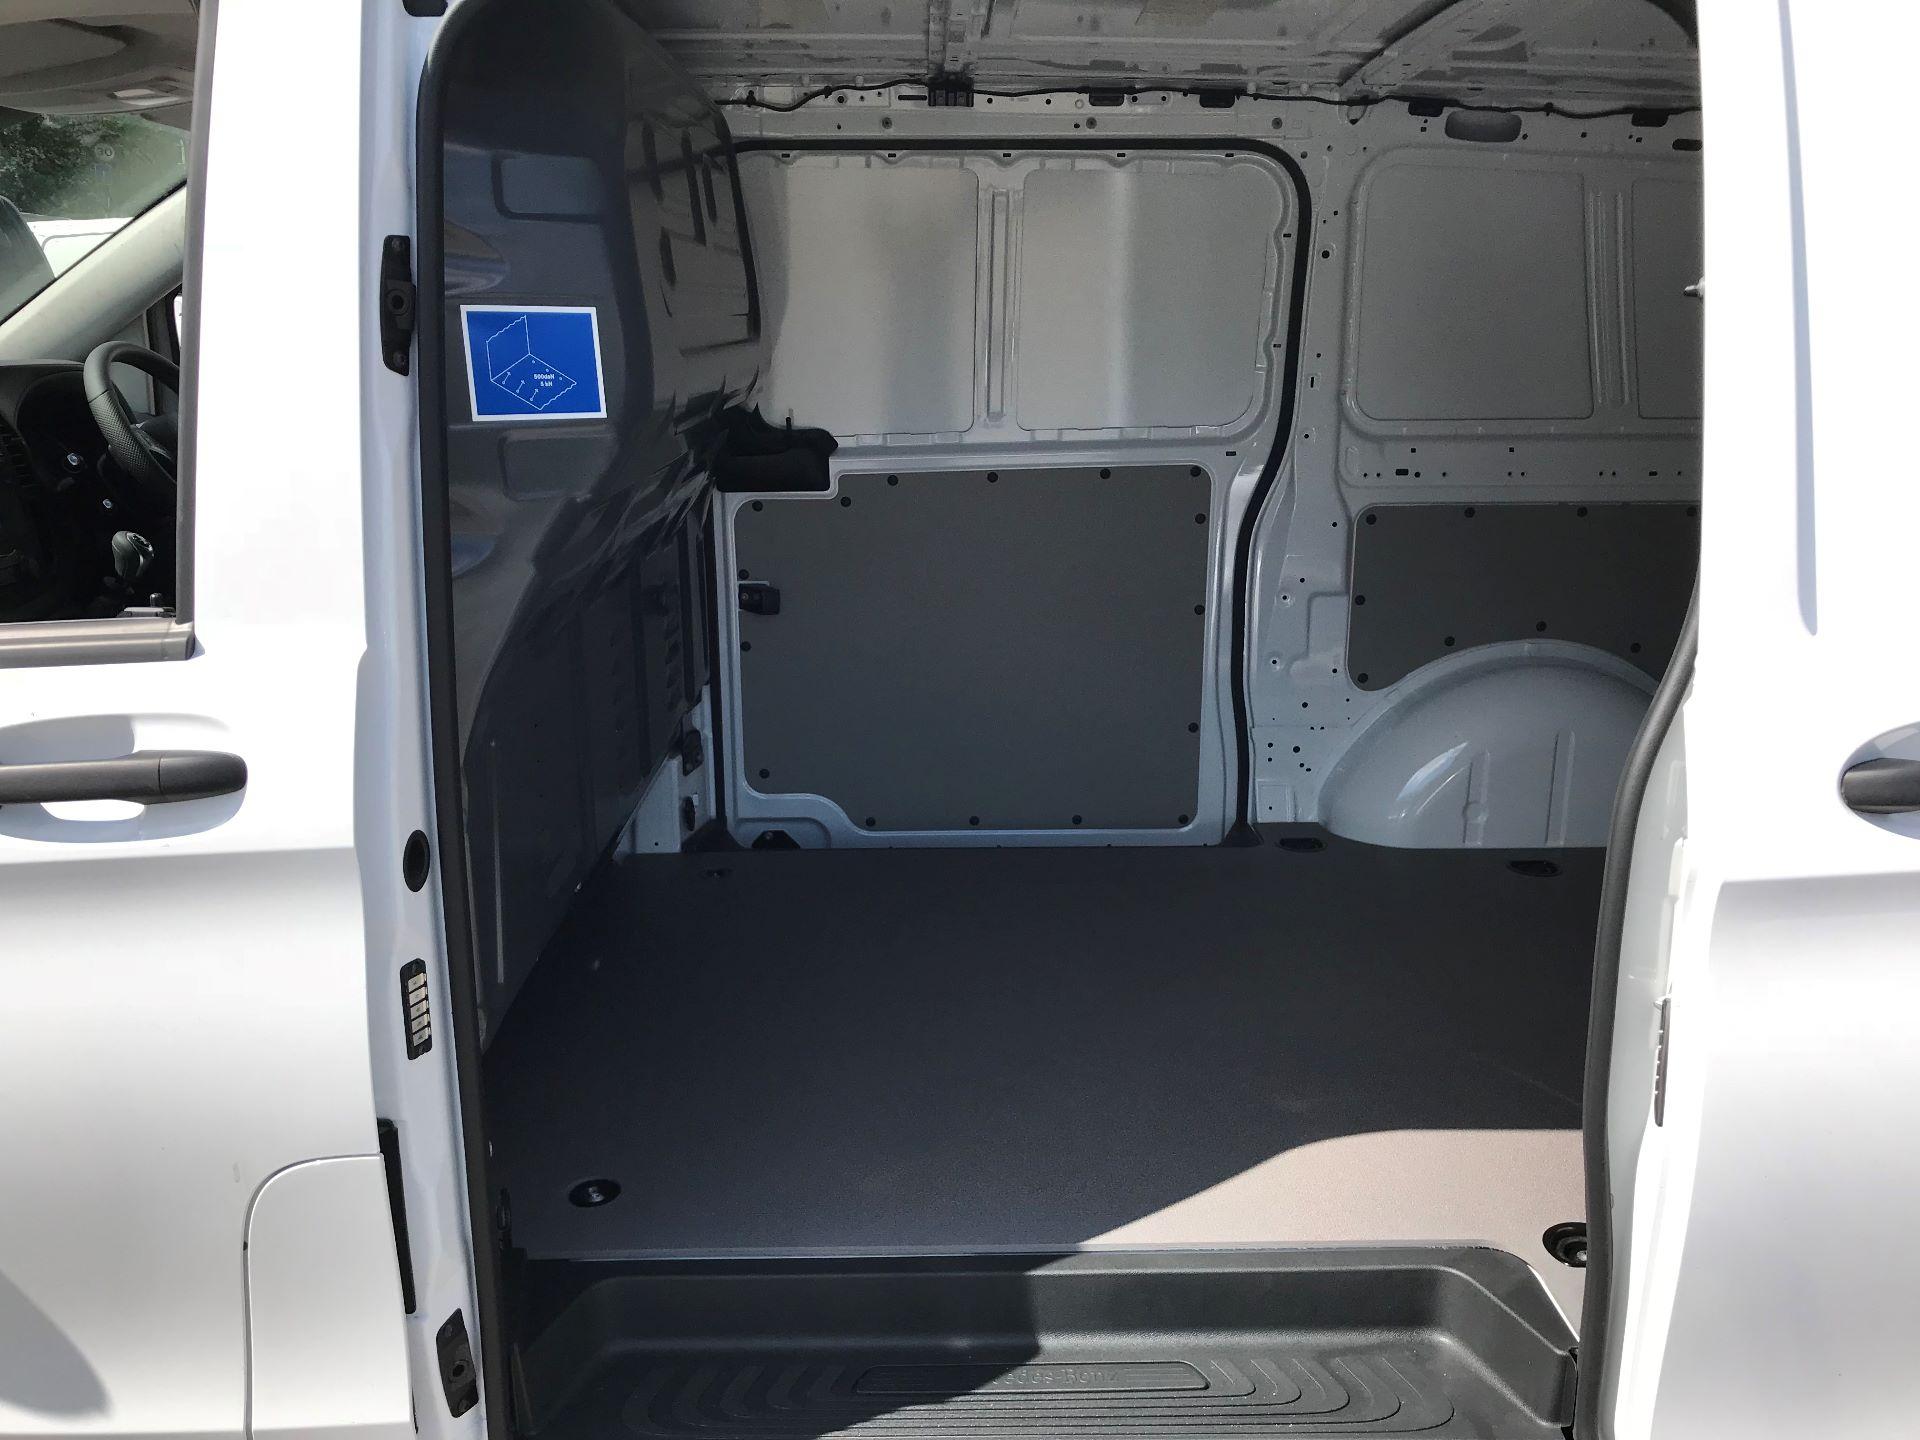 2019 Mercedes-Benz Vito 111Cdi Van Euro 6 Massive specification A/C (YM19FPU) Image 5